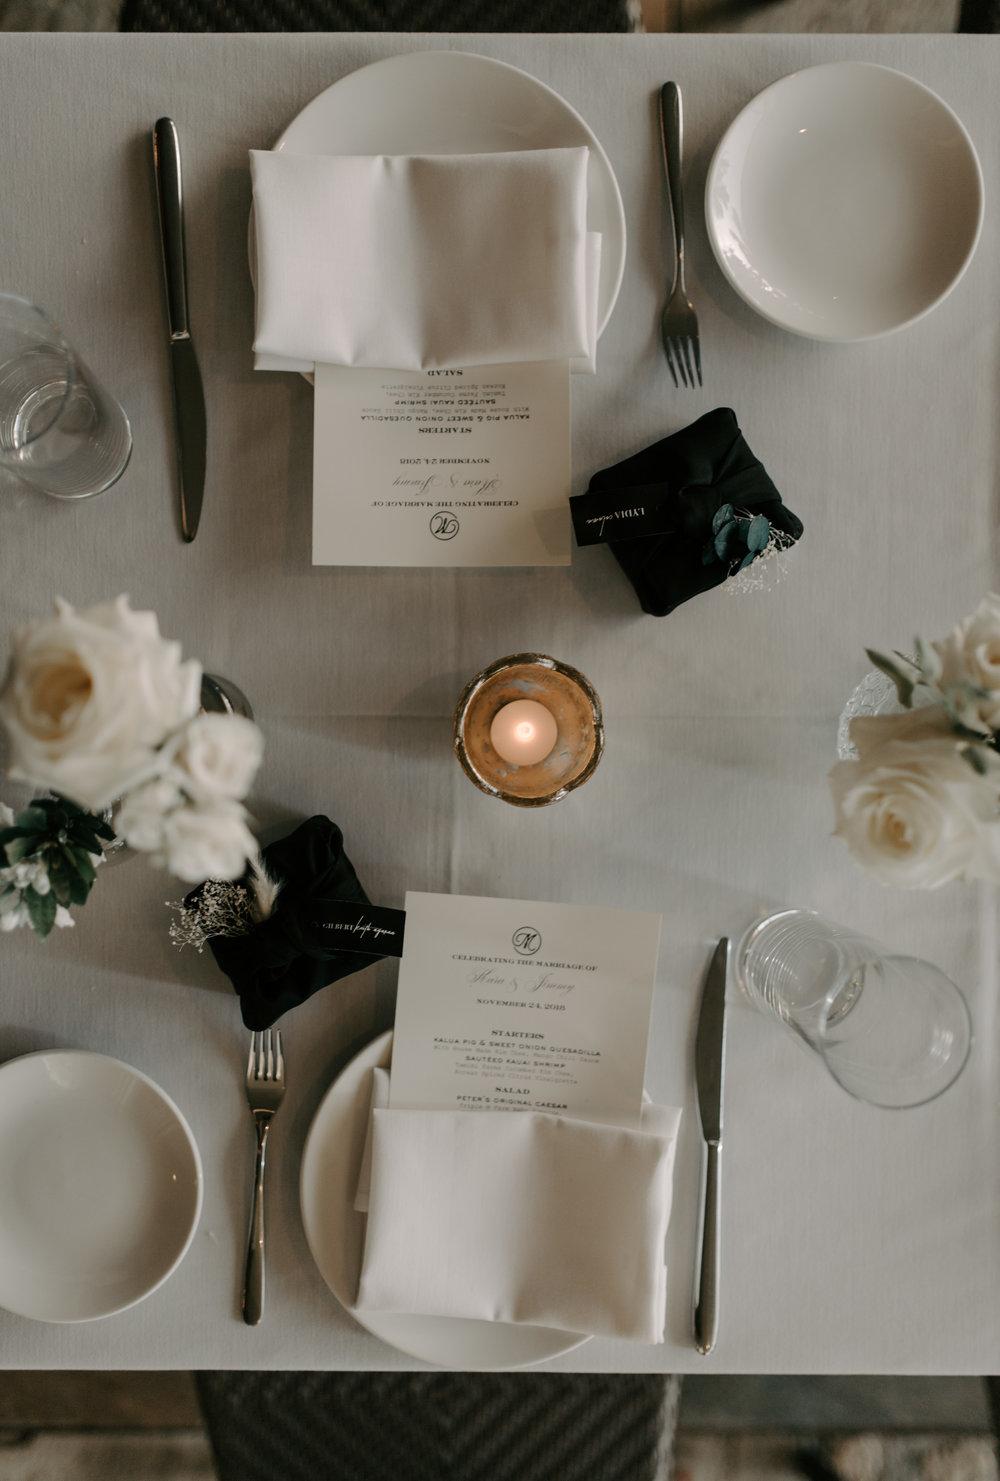 Wedding reception tablescape from above | Merriman's Kapalua Maui wedding by Hawaii wedding photographer Desiree Leilani